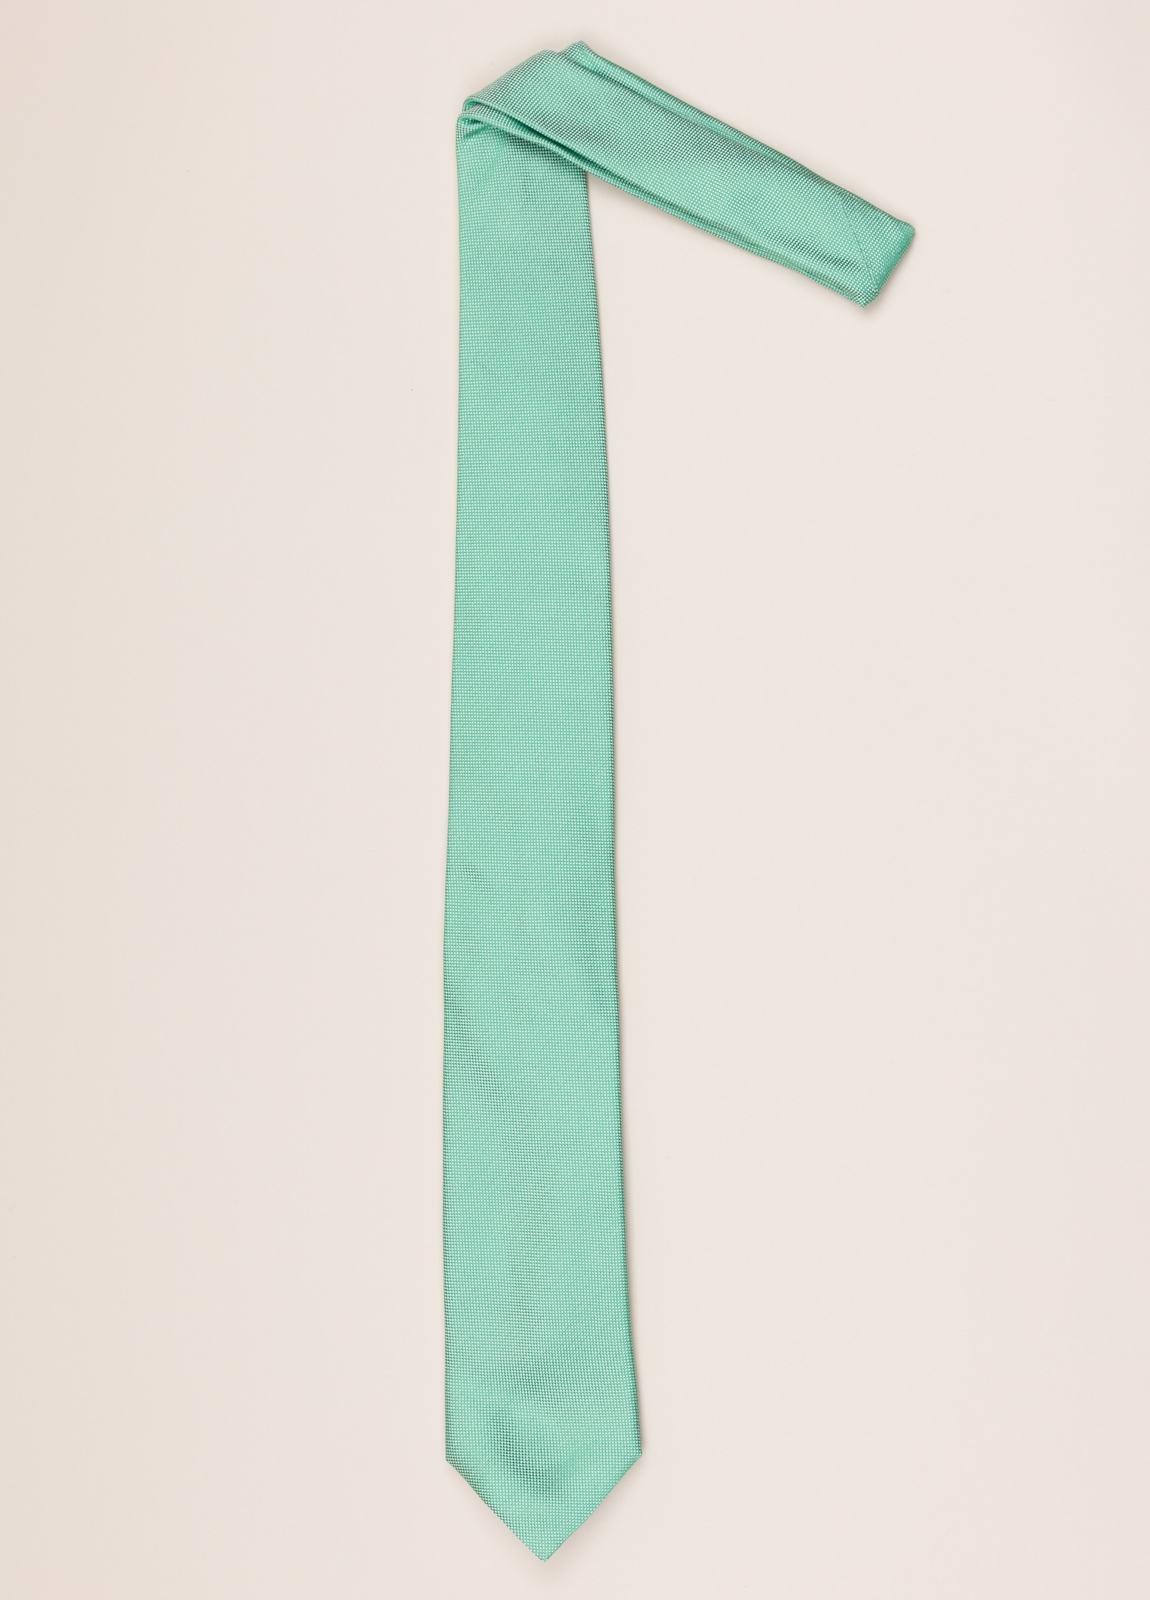 Corbata FUREST COLECCIÓN verde - Ítem1